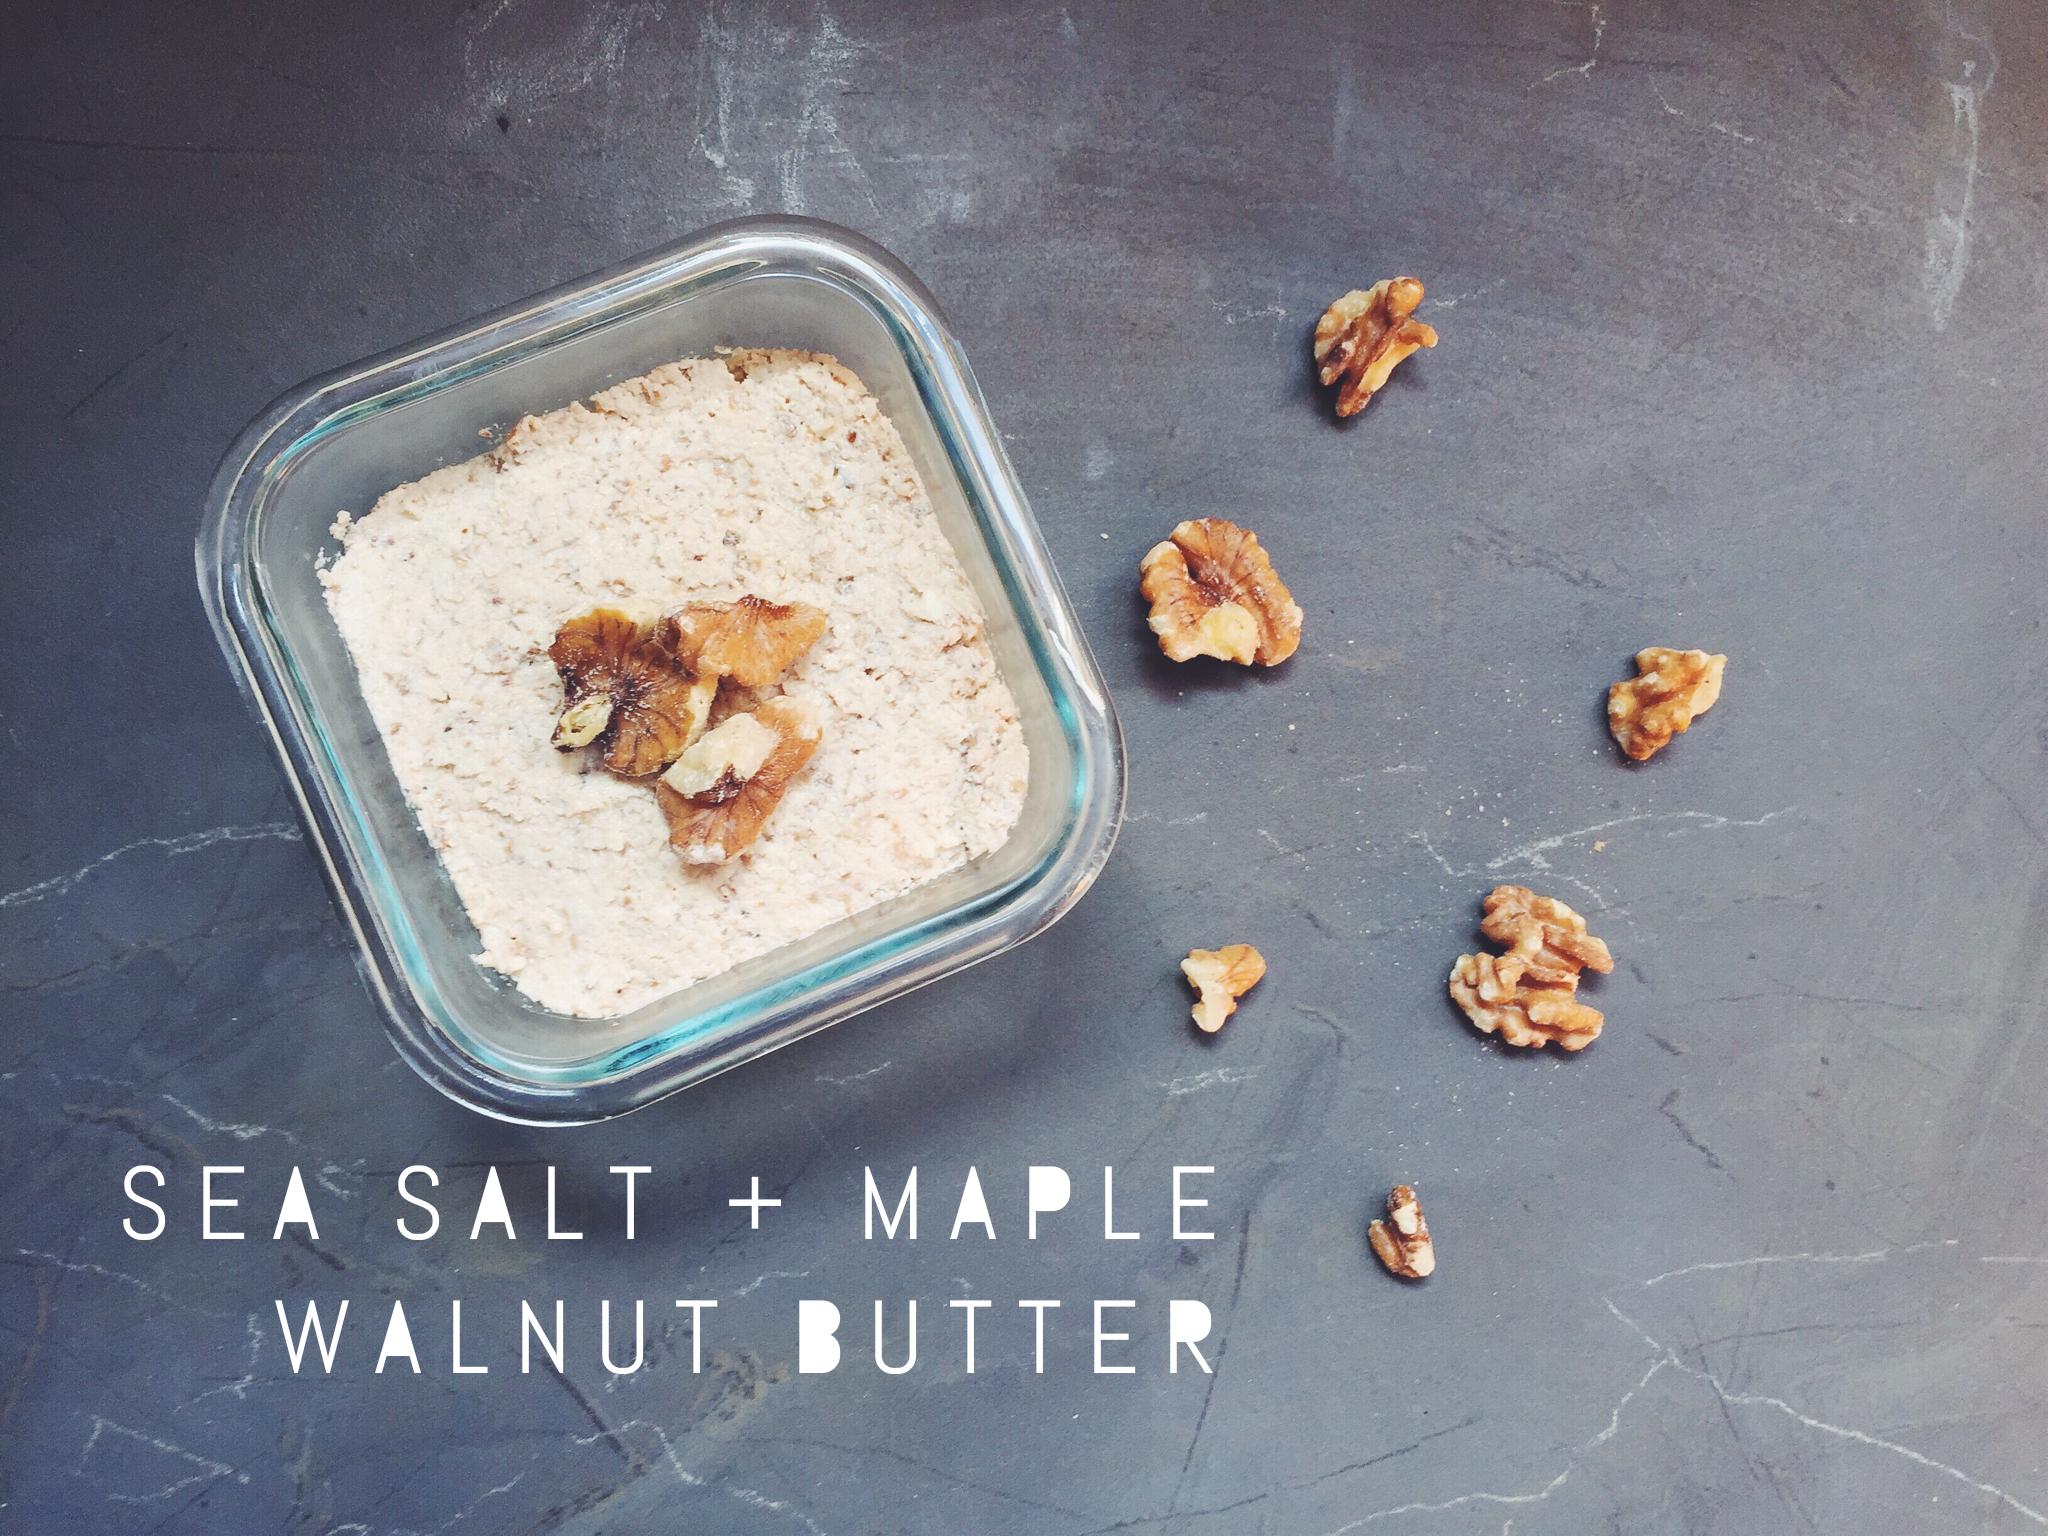 sea salt and maple walnut butter